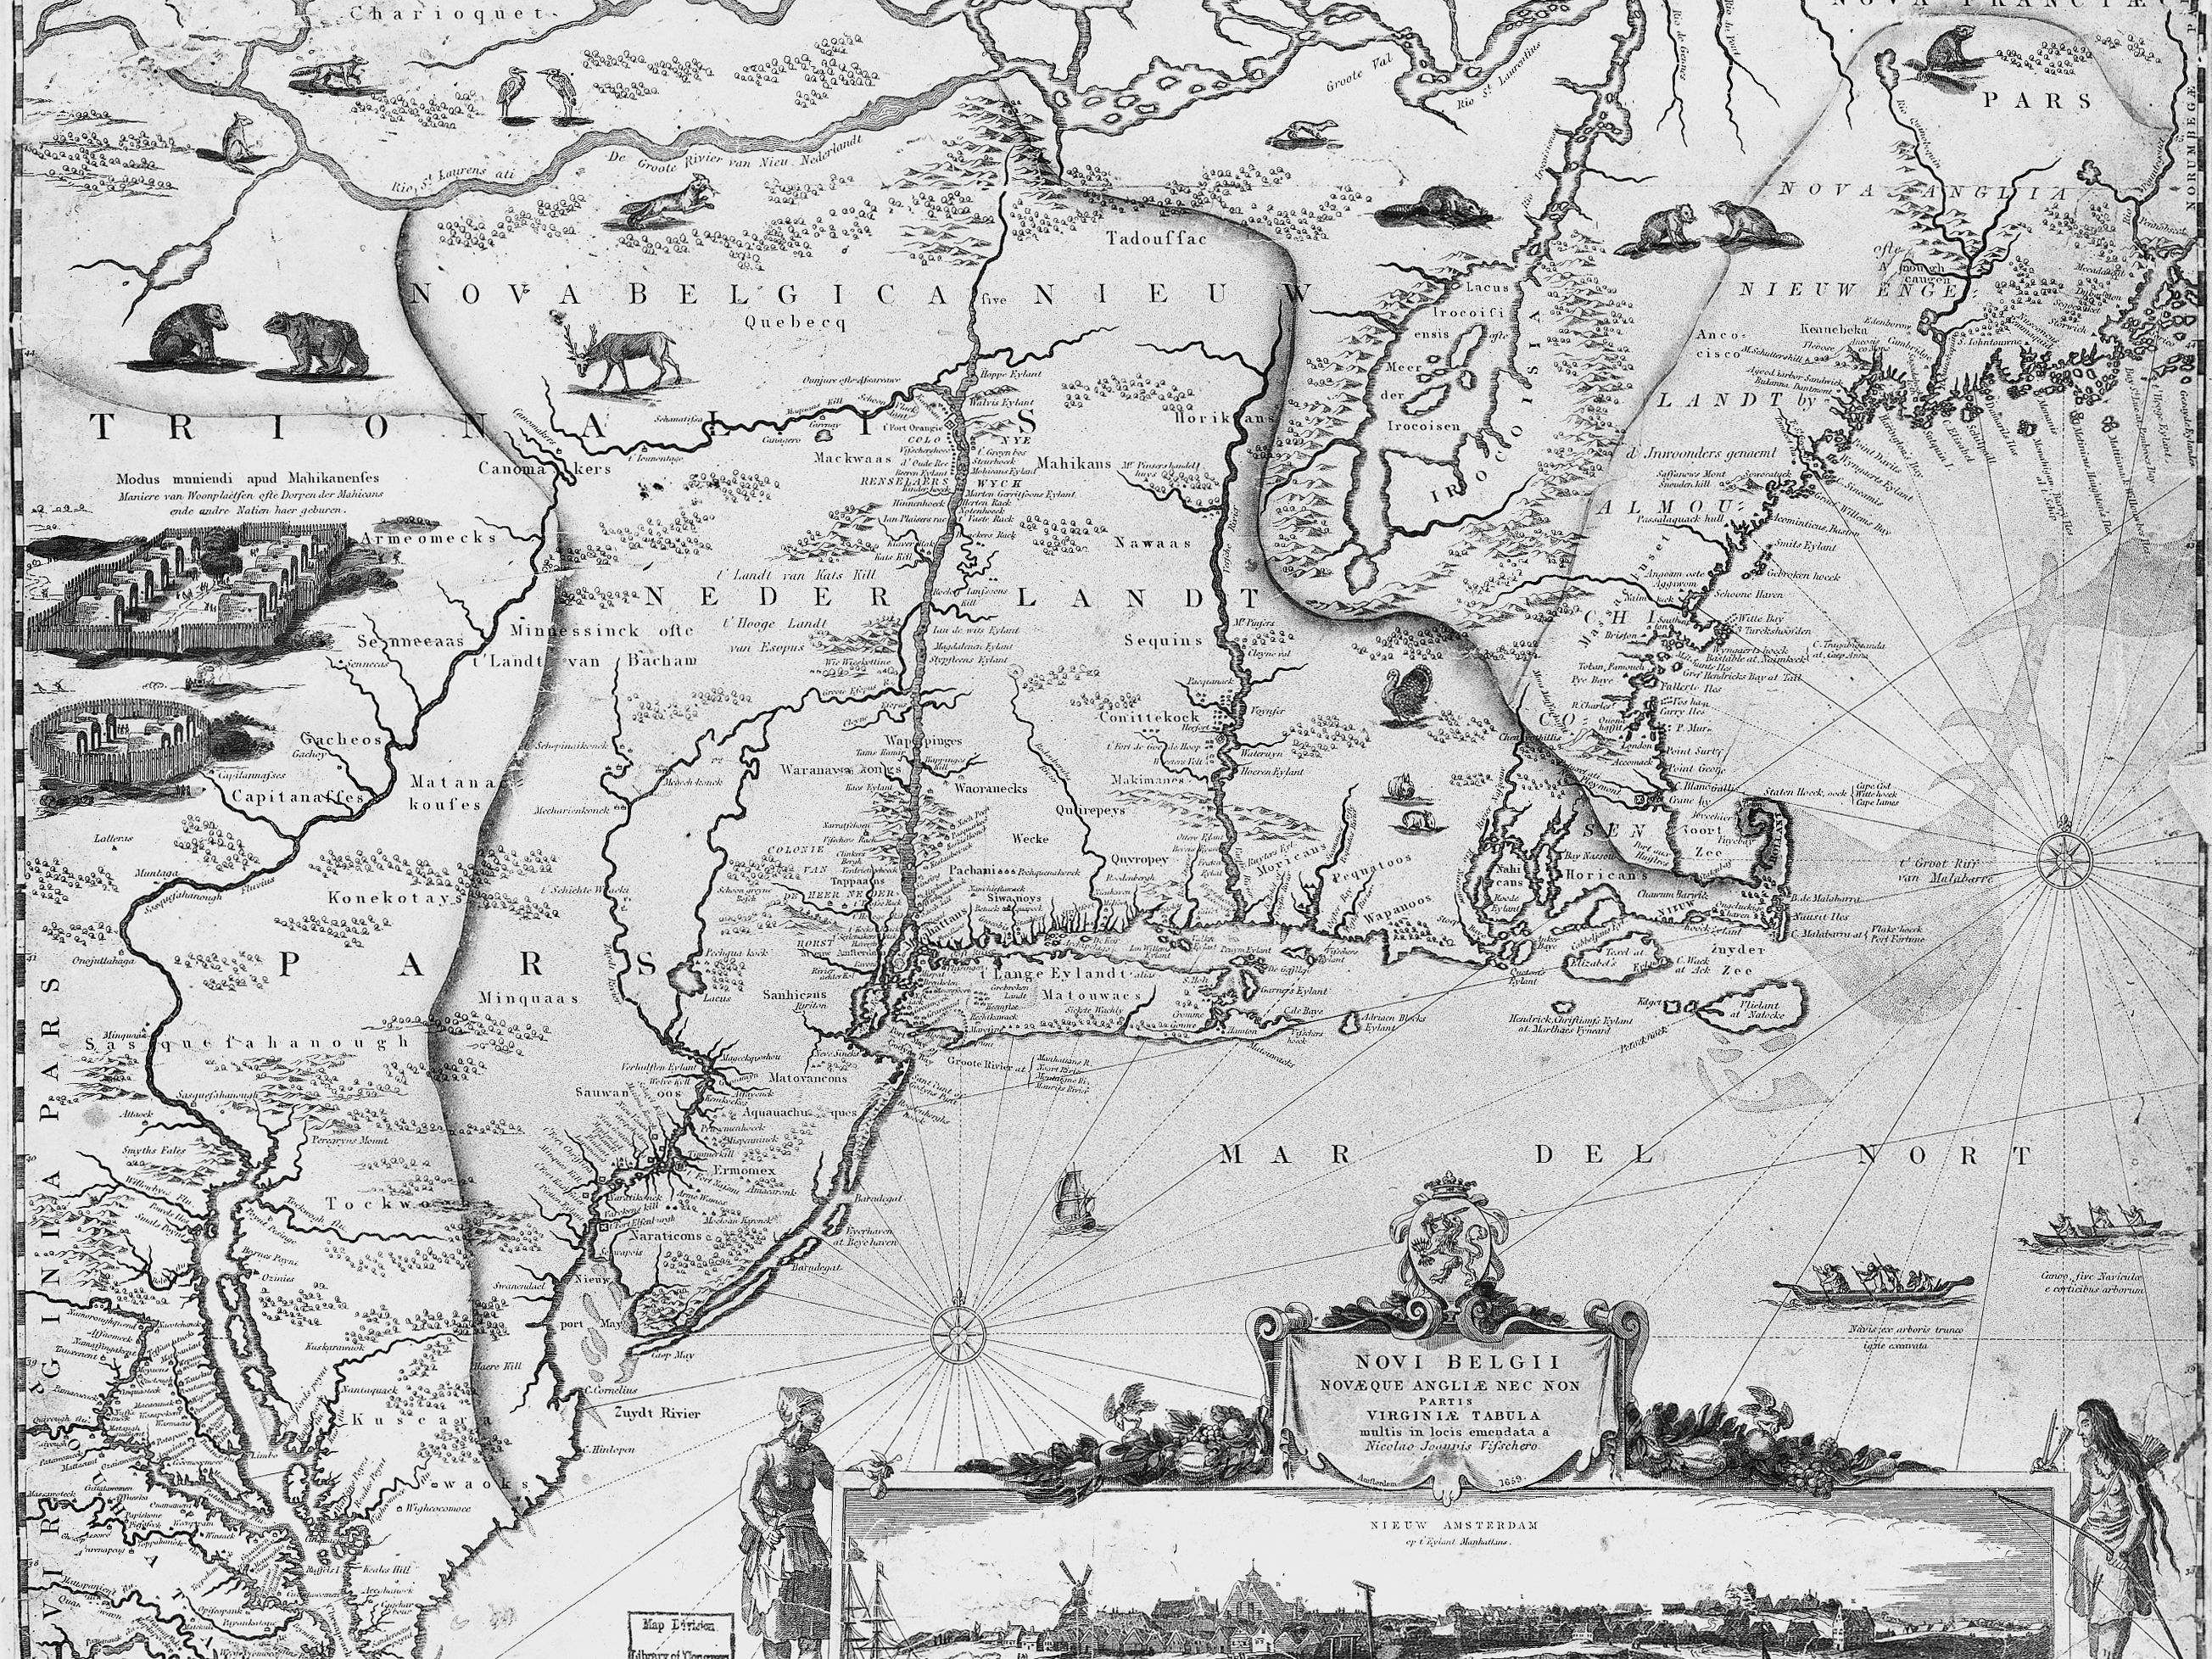 Massachusetts Colony Fun Facts